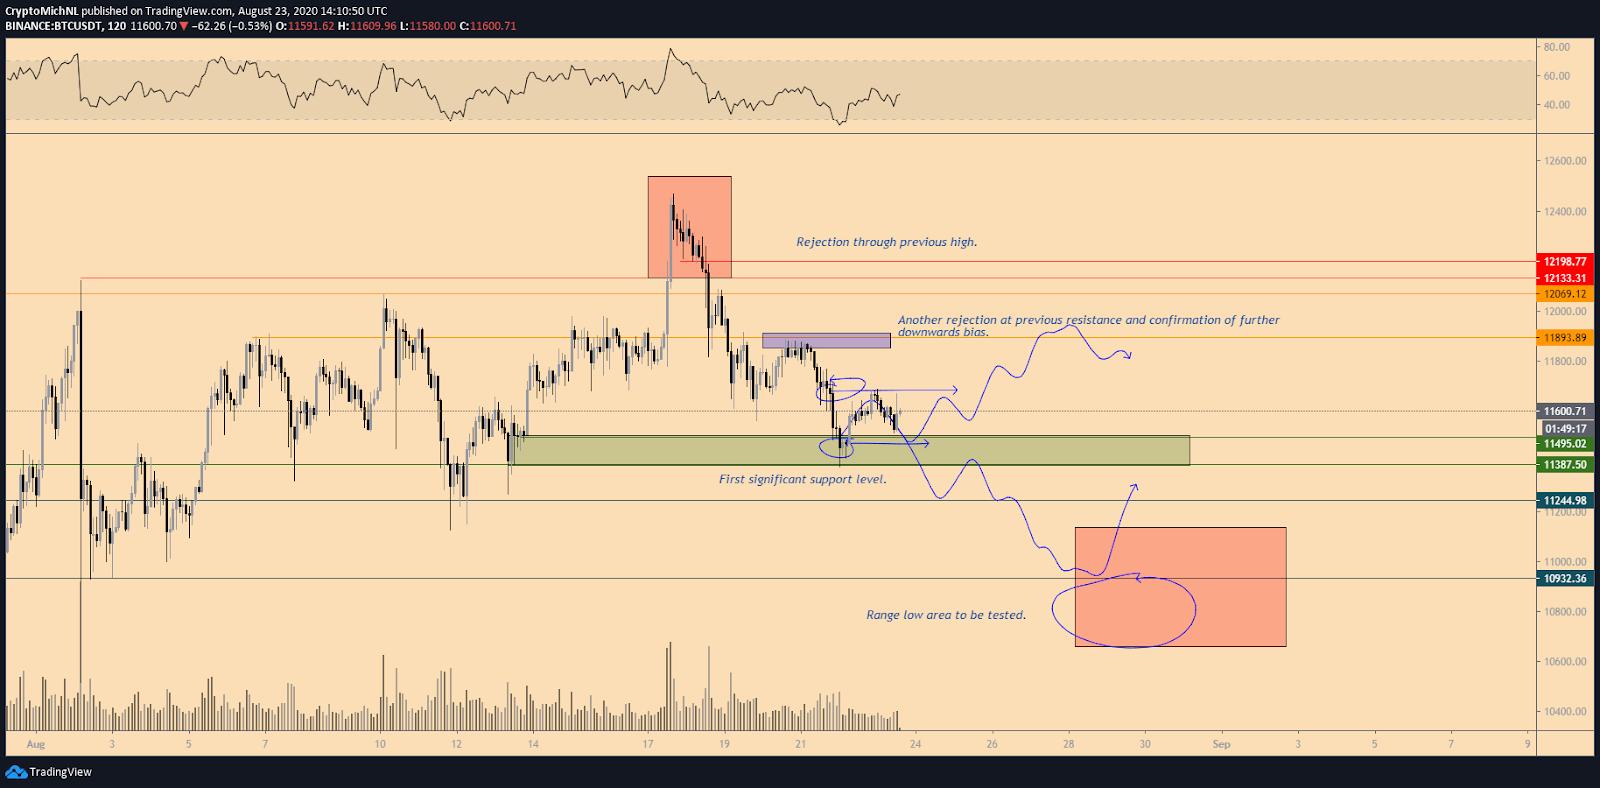 BTC/USD short-term analysis